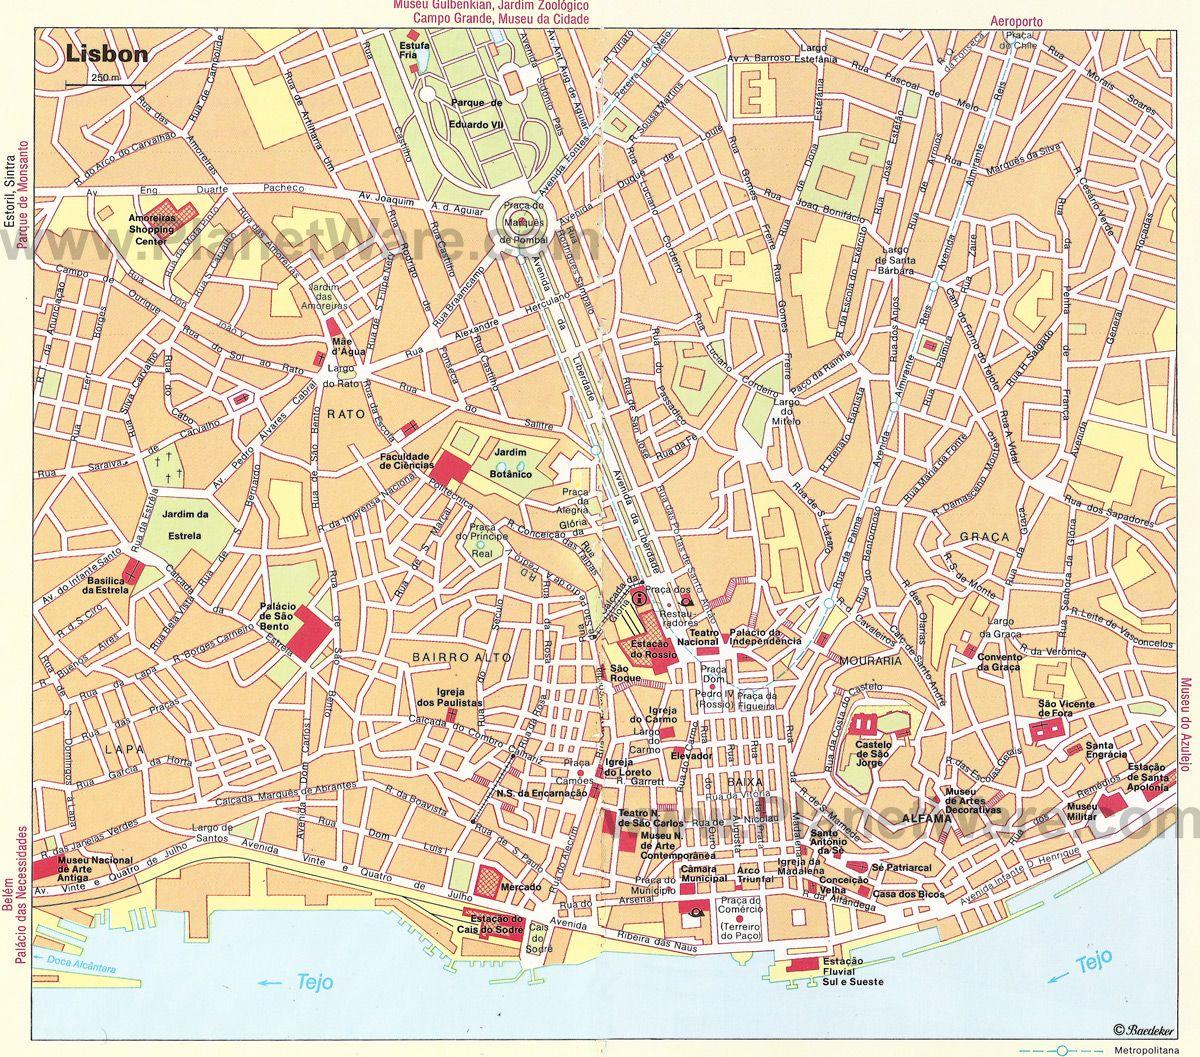 Lisbon Portugal Must Do Travel Tips: Lisbon Map - Tourist Attractions